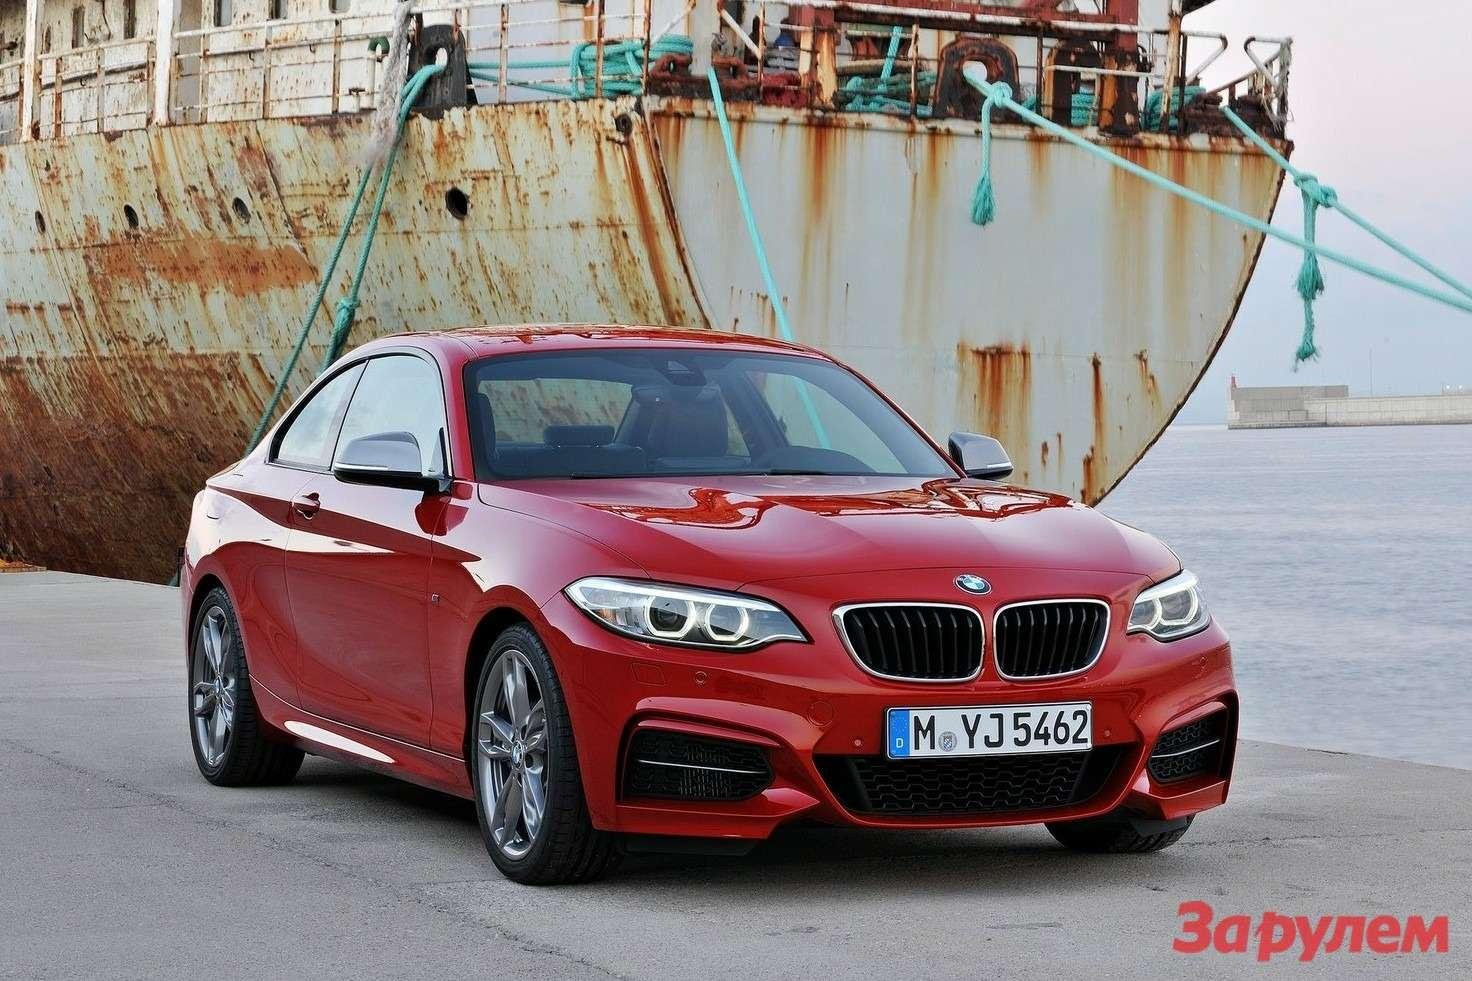 BMWM235i Coupe